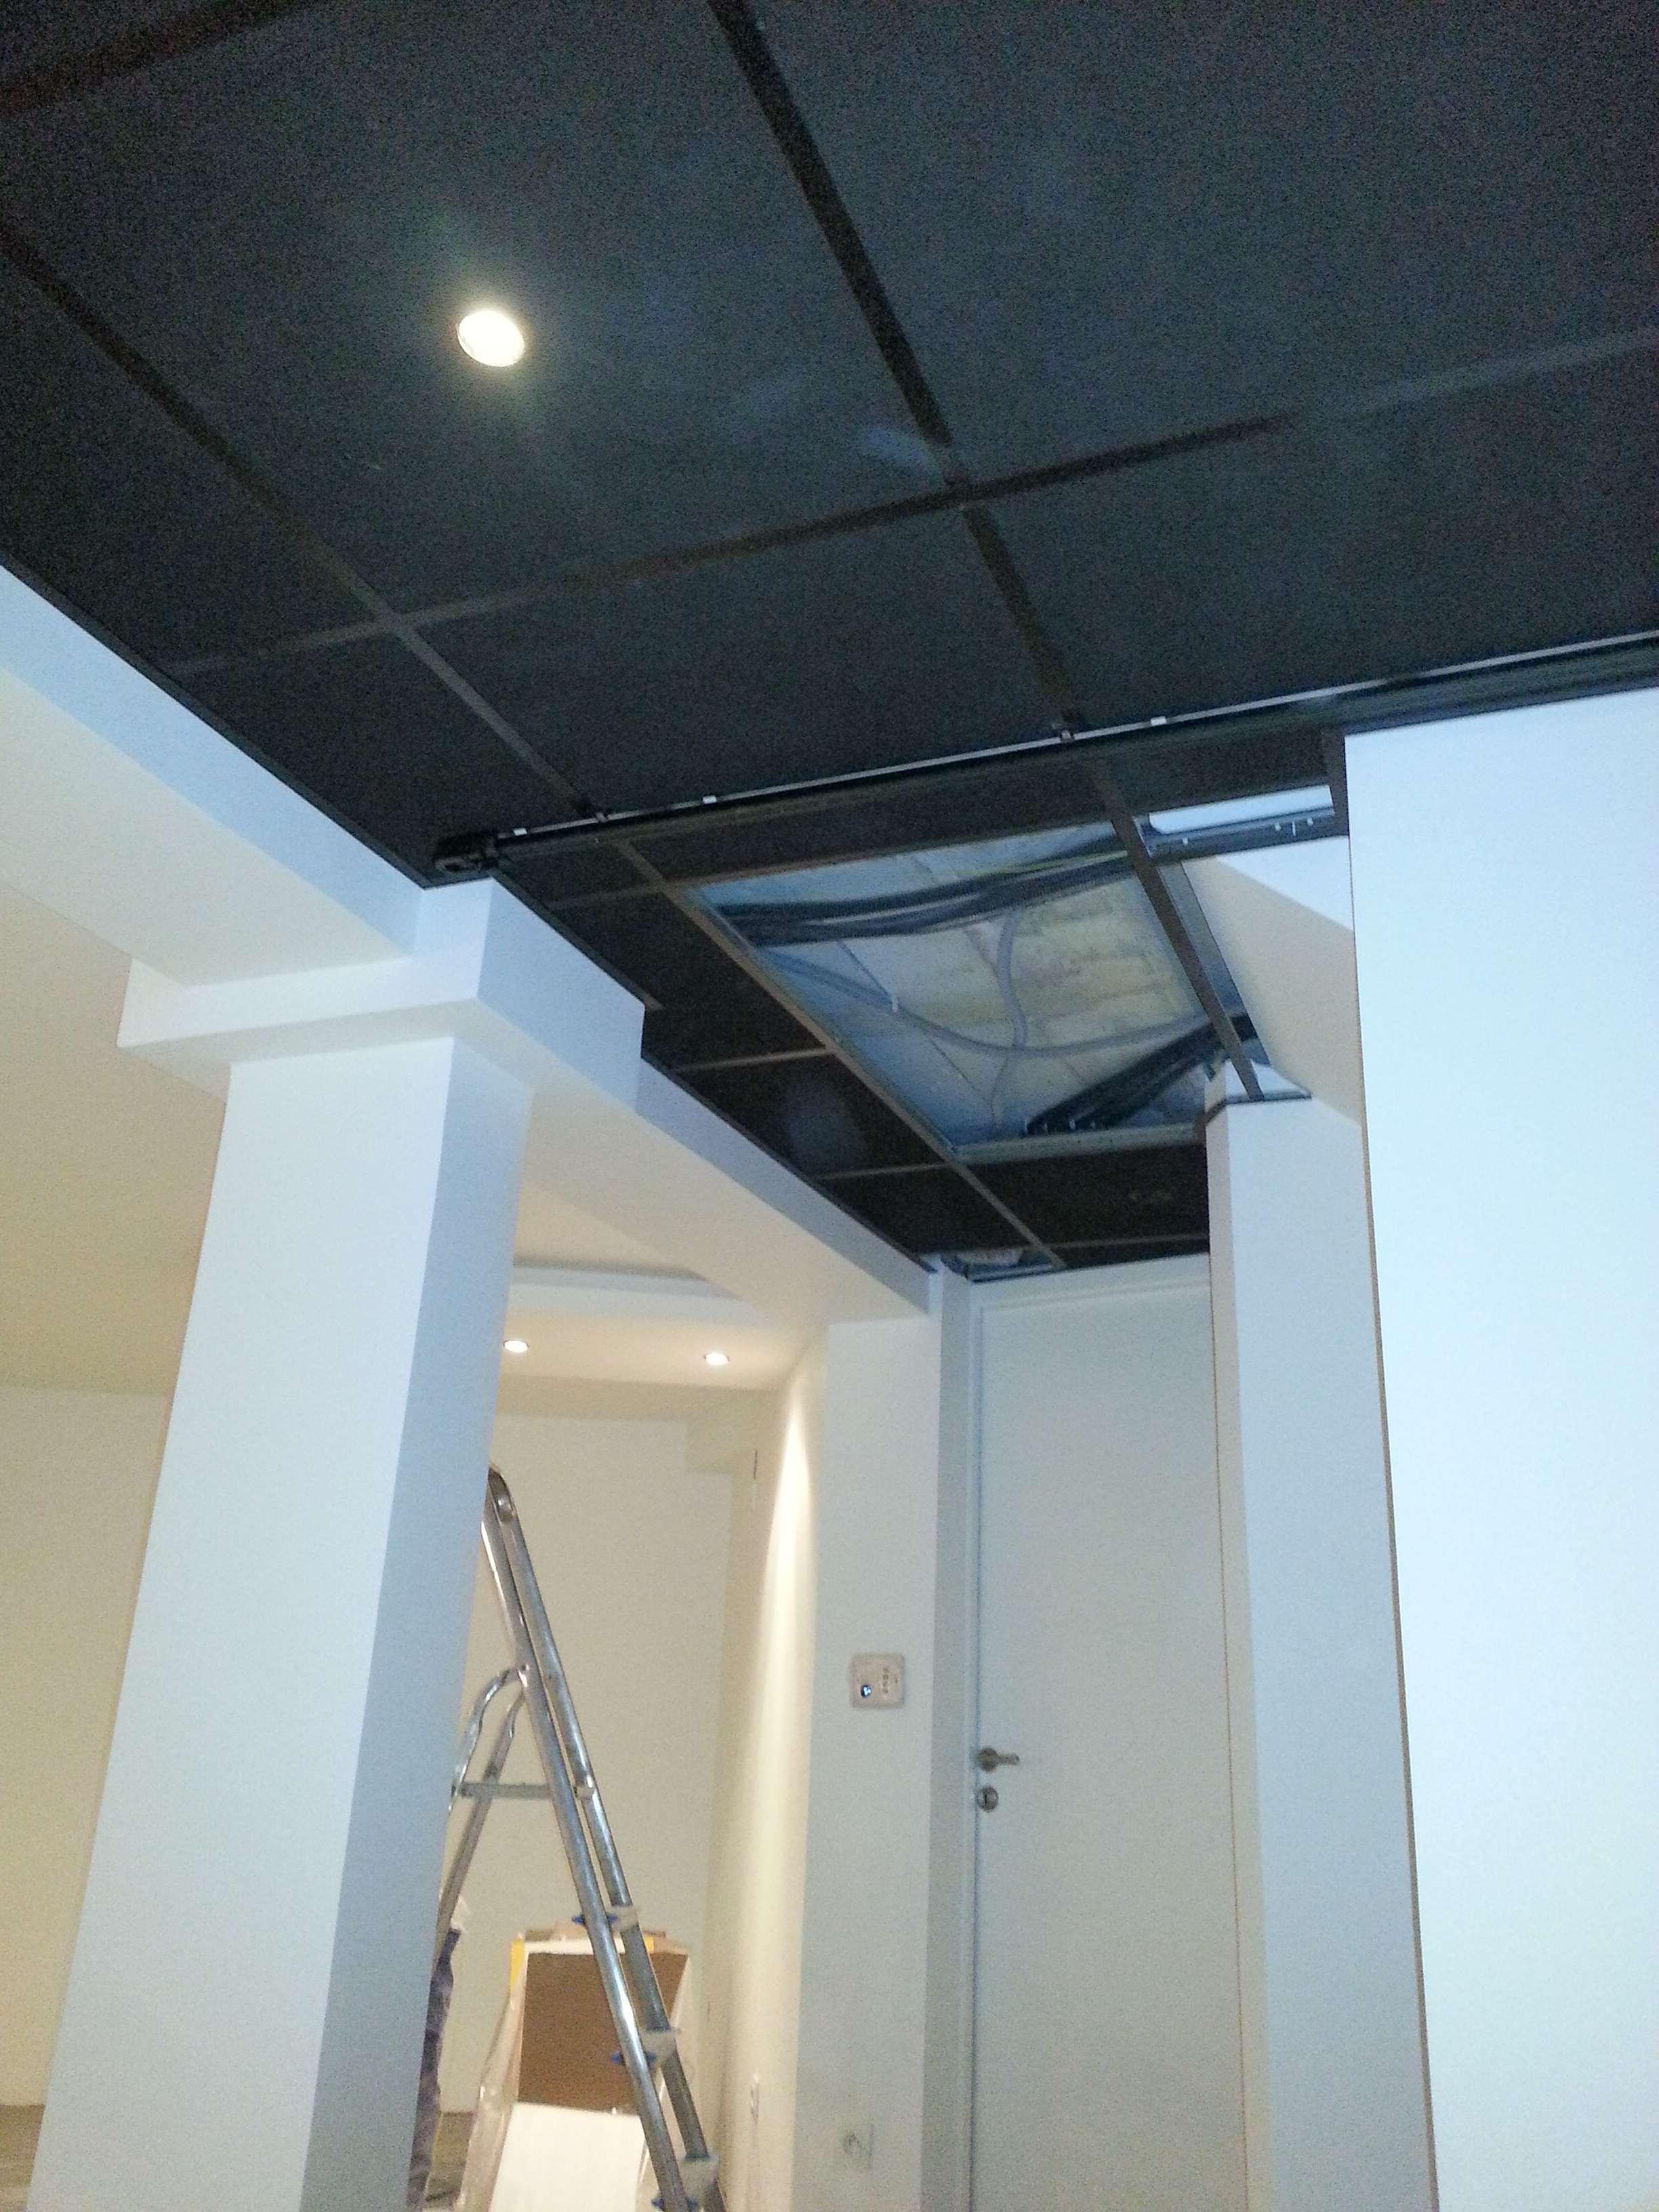 Tbb media room lounge oppo upgrad page 13 29980461 sur le - Retouche peinture plafond ...